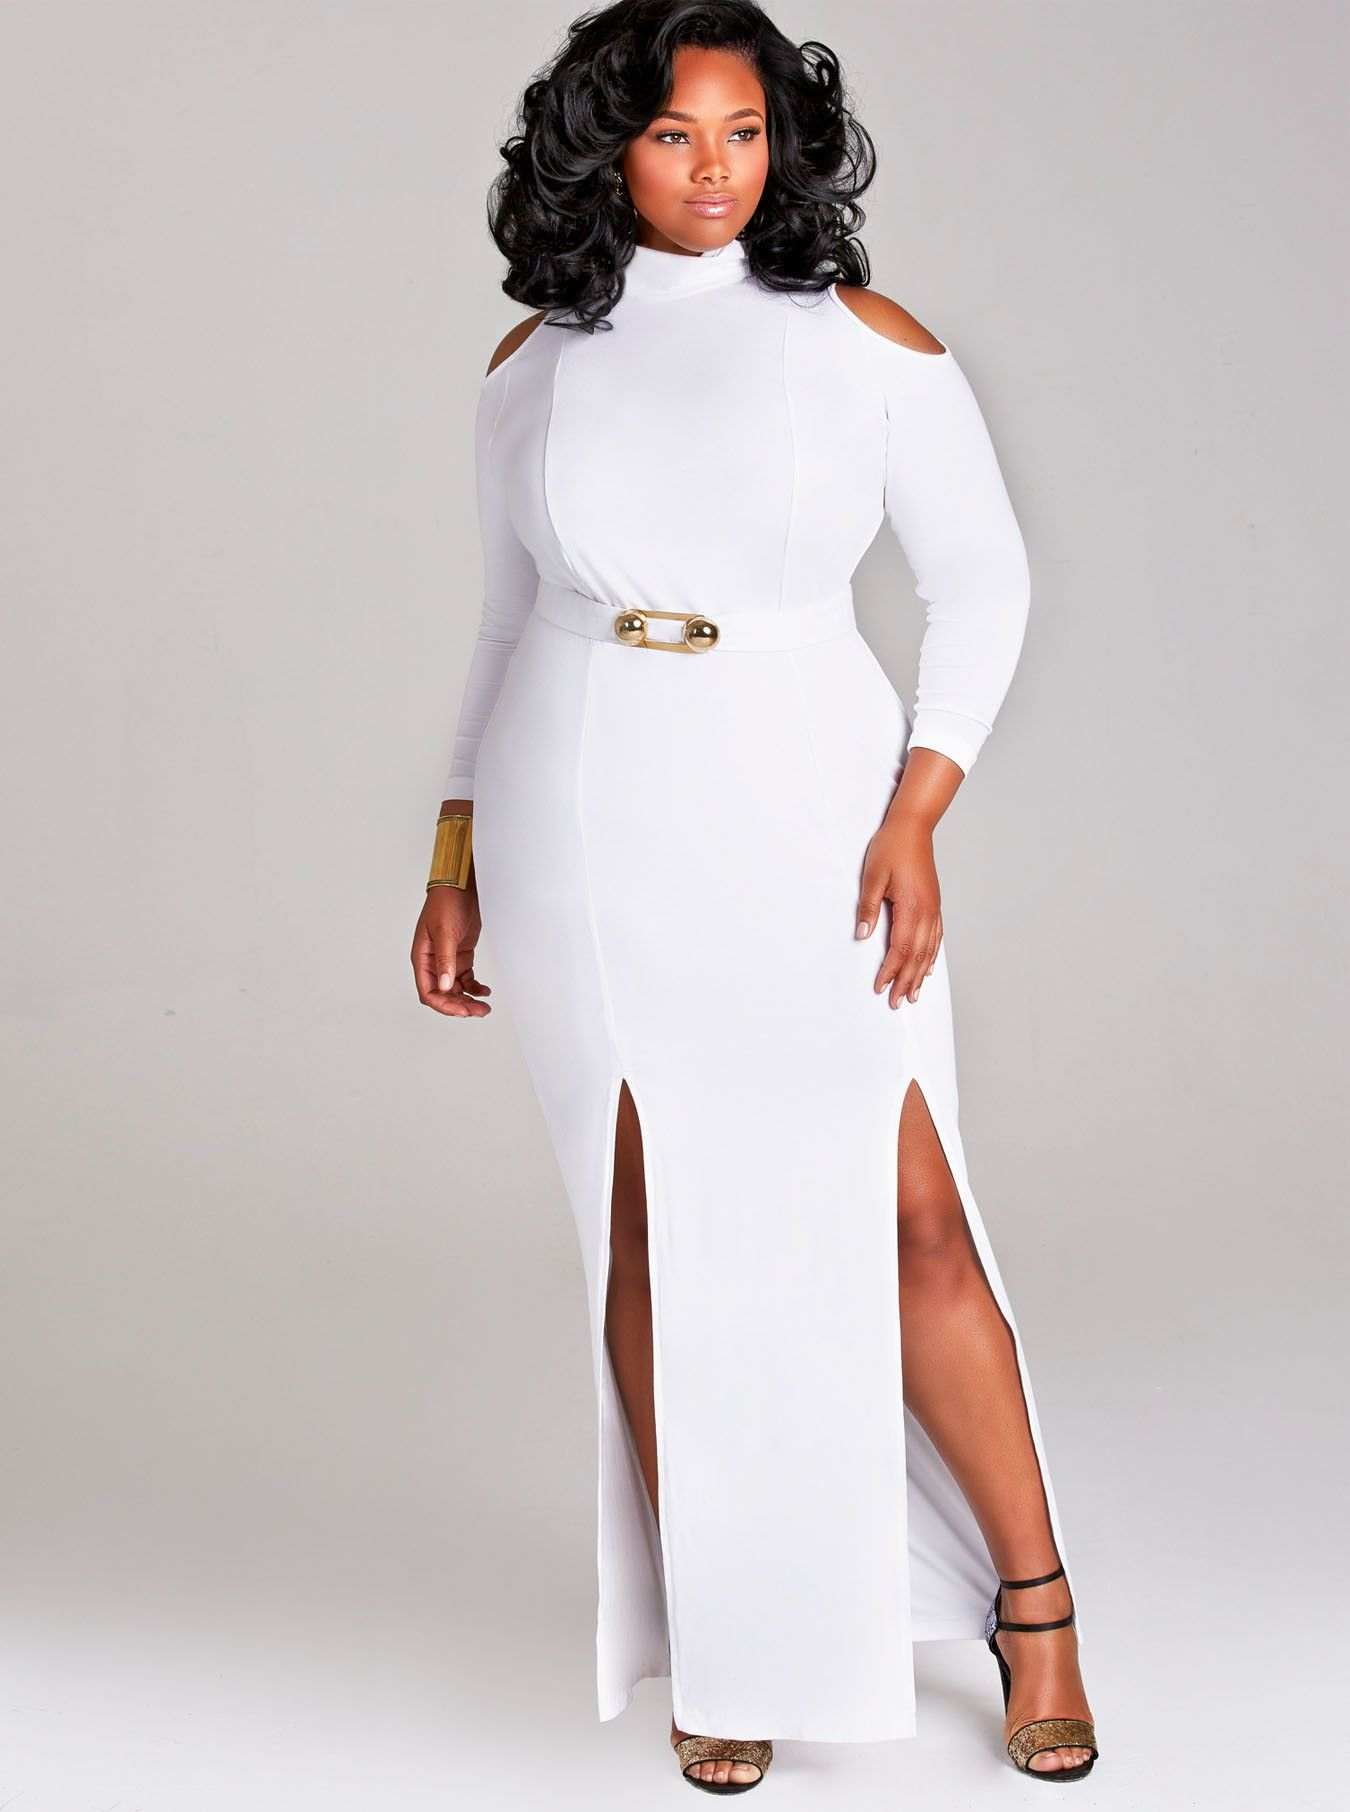 Plus Size White Cocktail Dresses Under 100 - Plus Size Masquerade ...